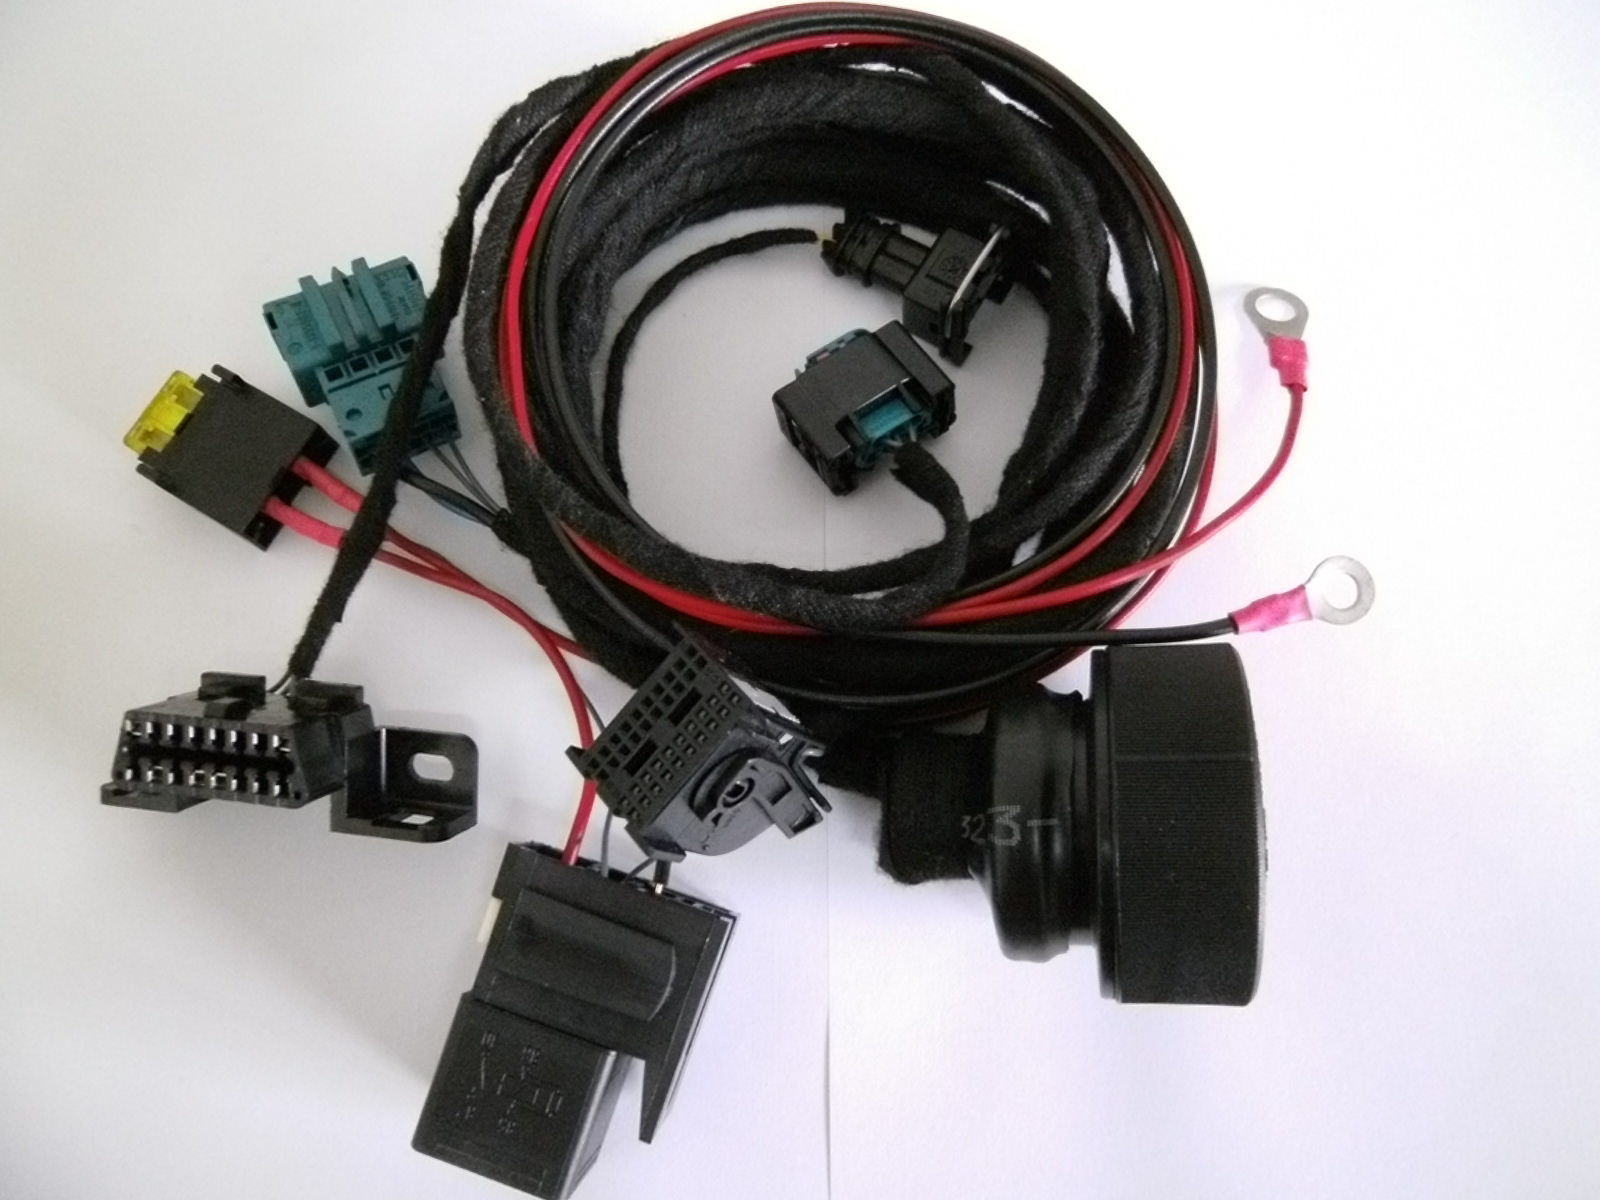 s l1600 1 m52tu m54 s54 s62 wiring loom adapter (e30 e34 e36 z3) hack